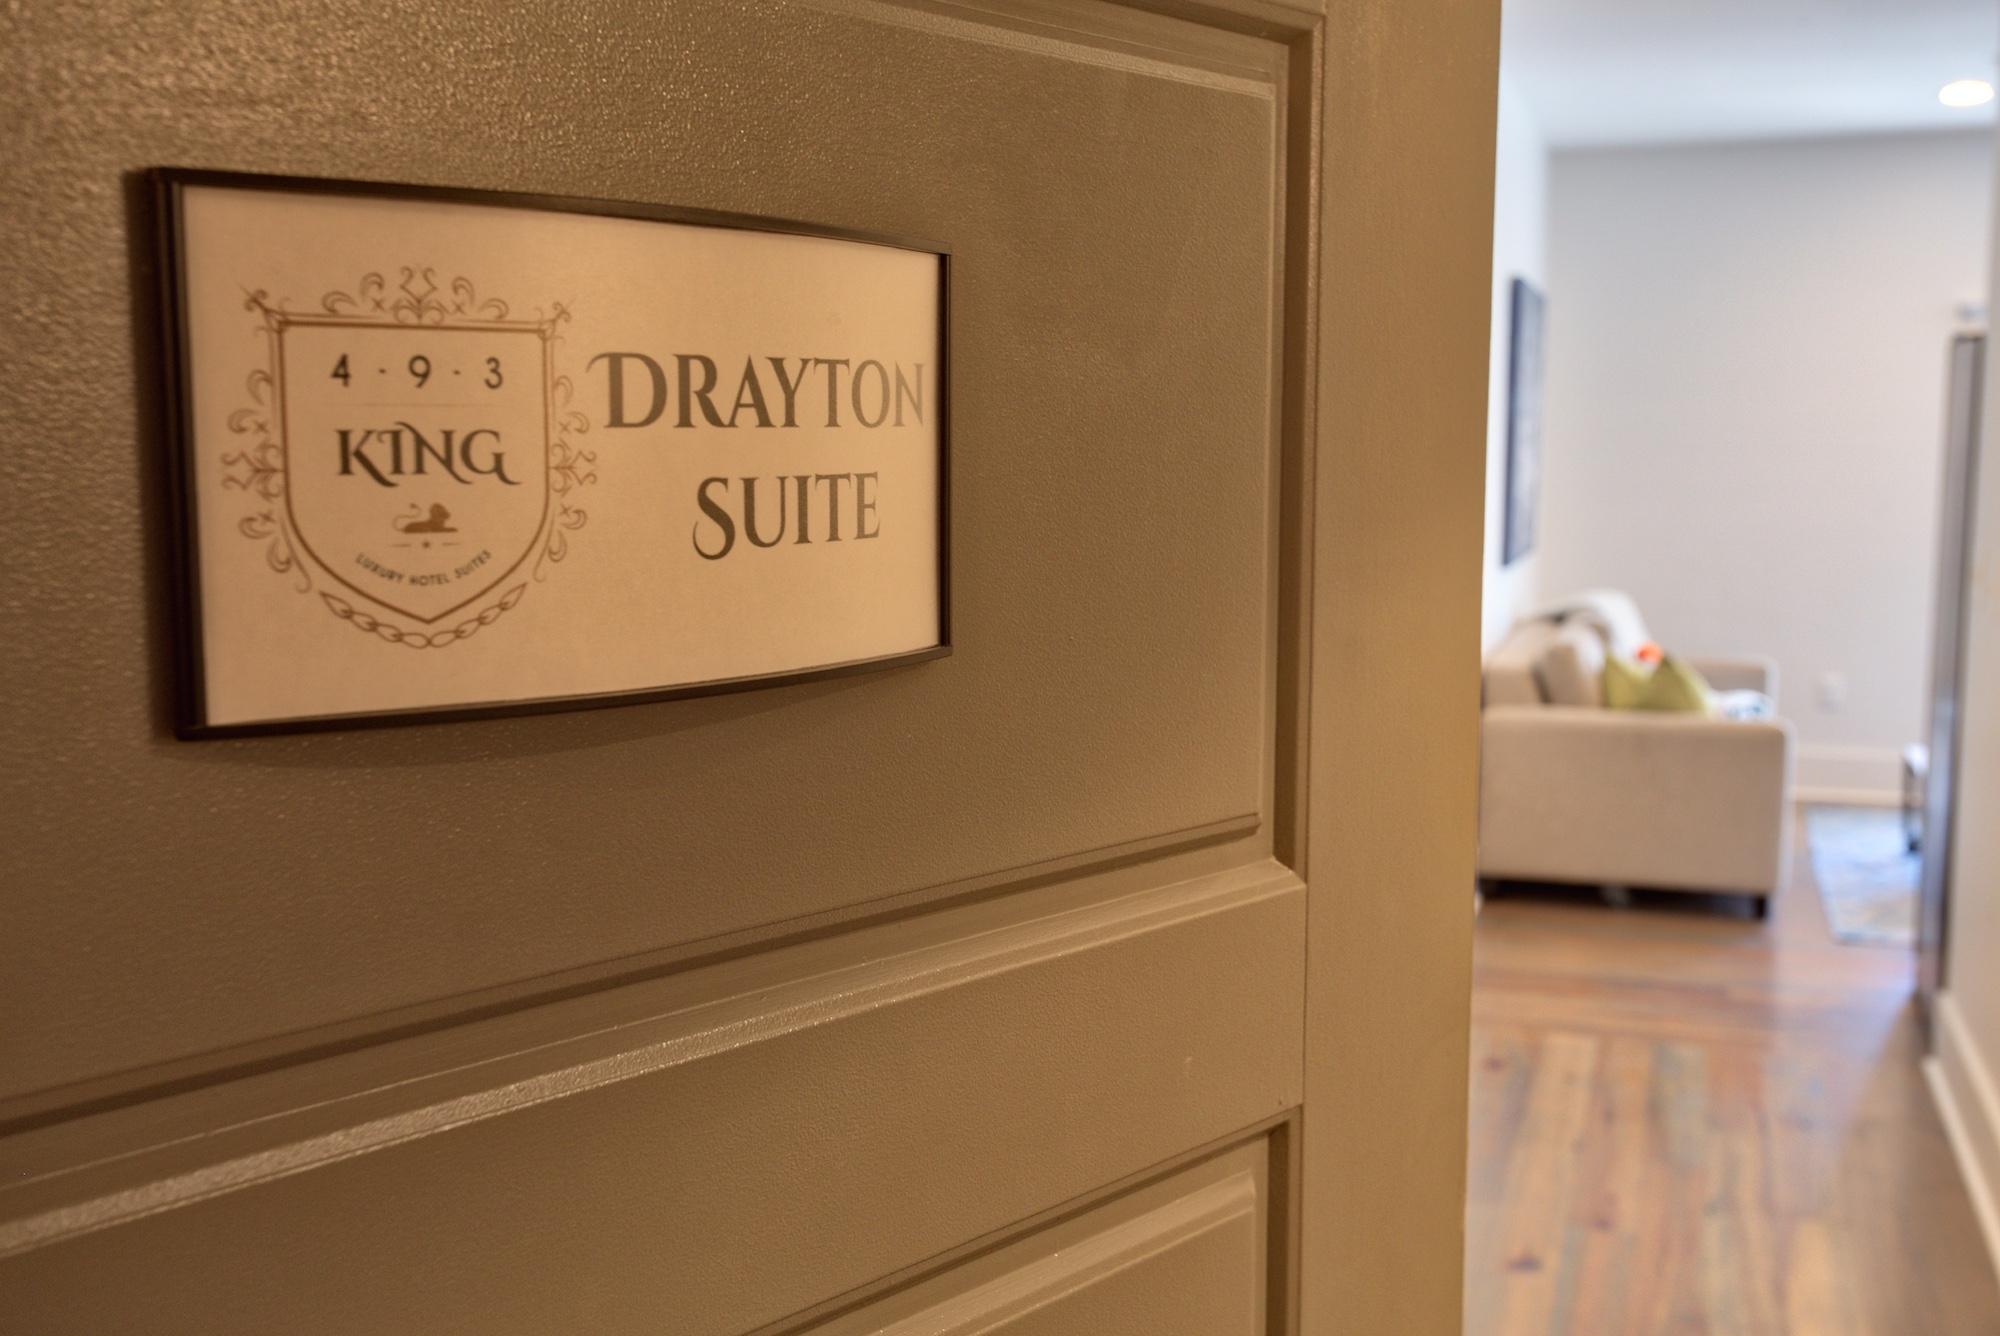 King Street Luxury Boutique Hotel The Drayton Charleston SC 1.jpeg